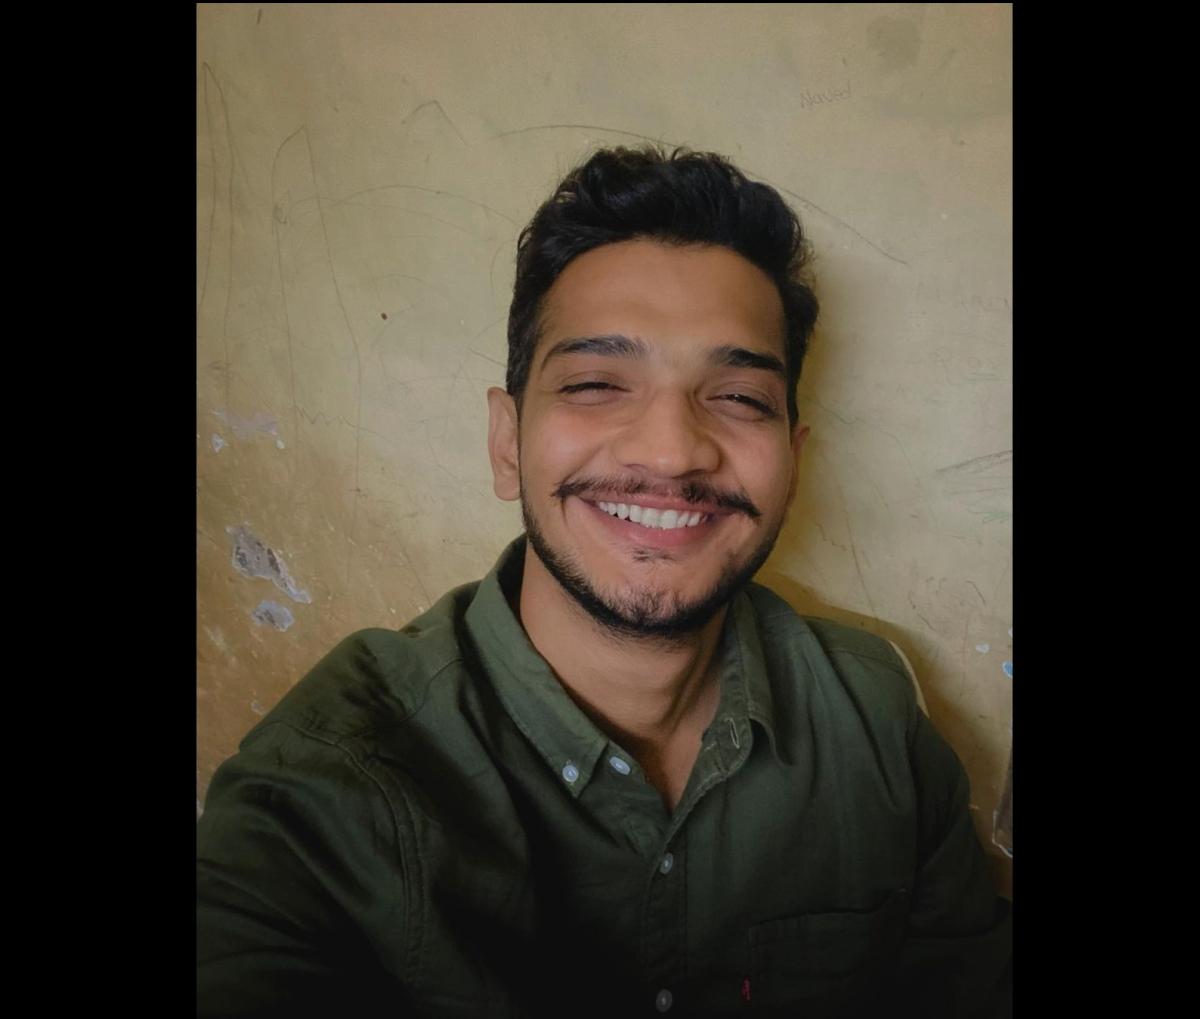 'Mere ander ke andheron ko karne do shikayat...': Check out Munawar Faruqui's first Instagram post after release from Indore jail